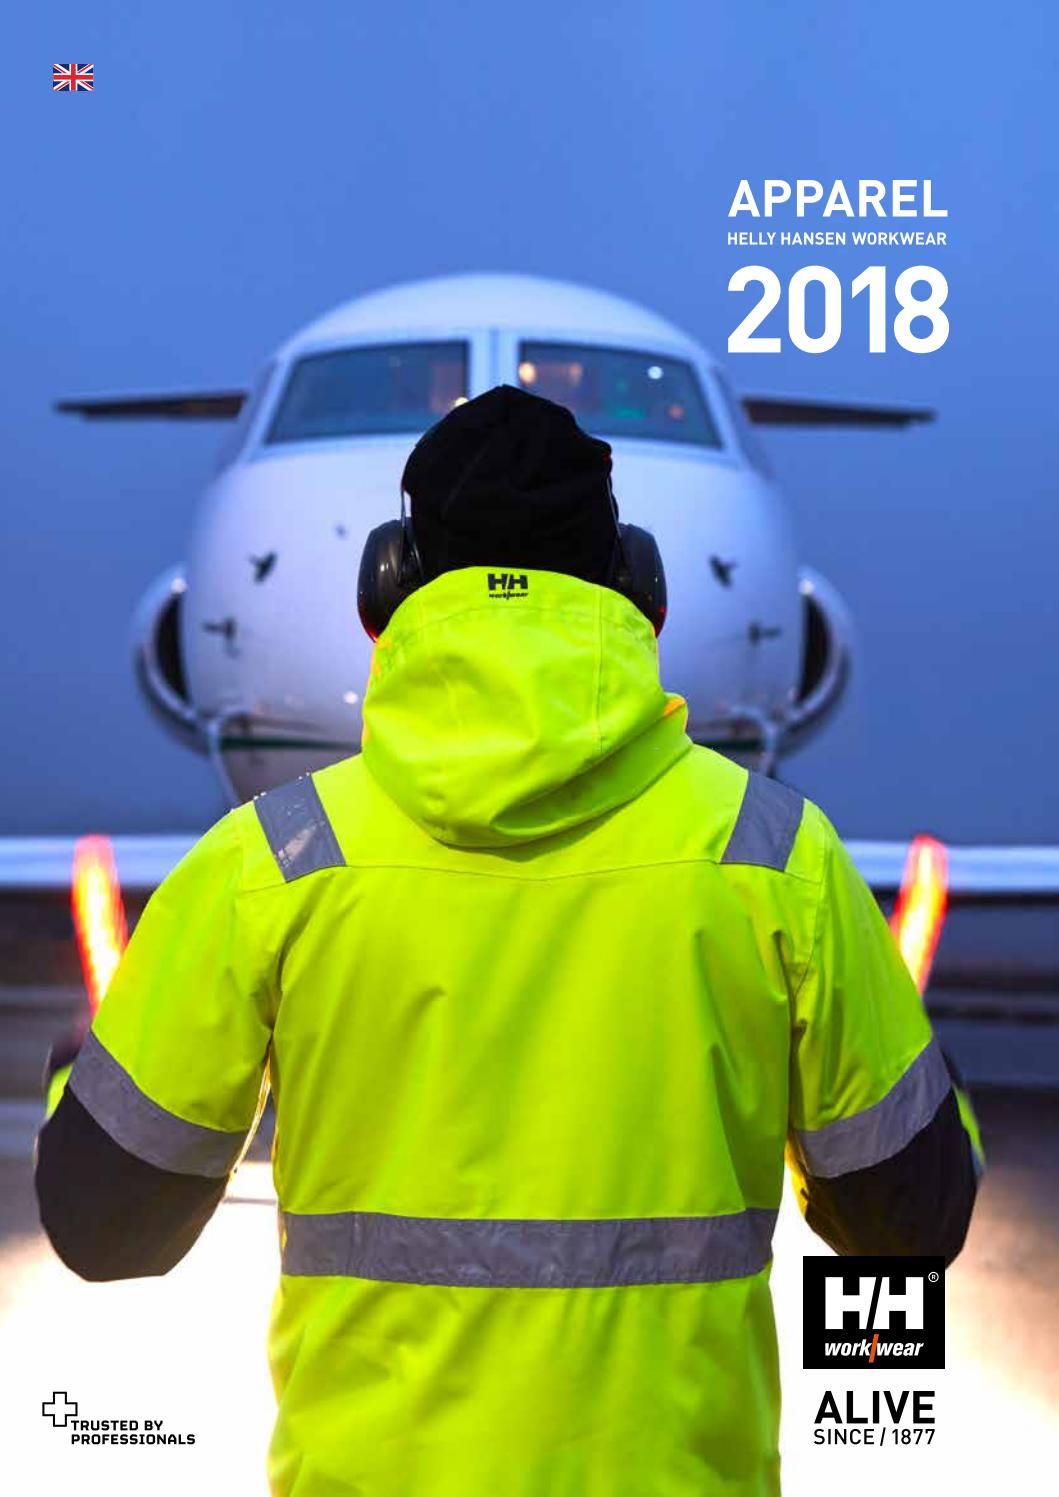 3441538d2eaa Helly Hansen Workwear Apparel 2018 – English by HH Workwear - issuu